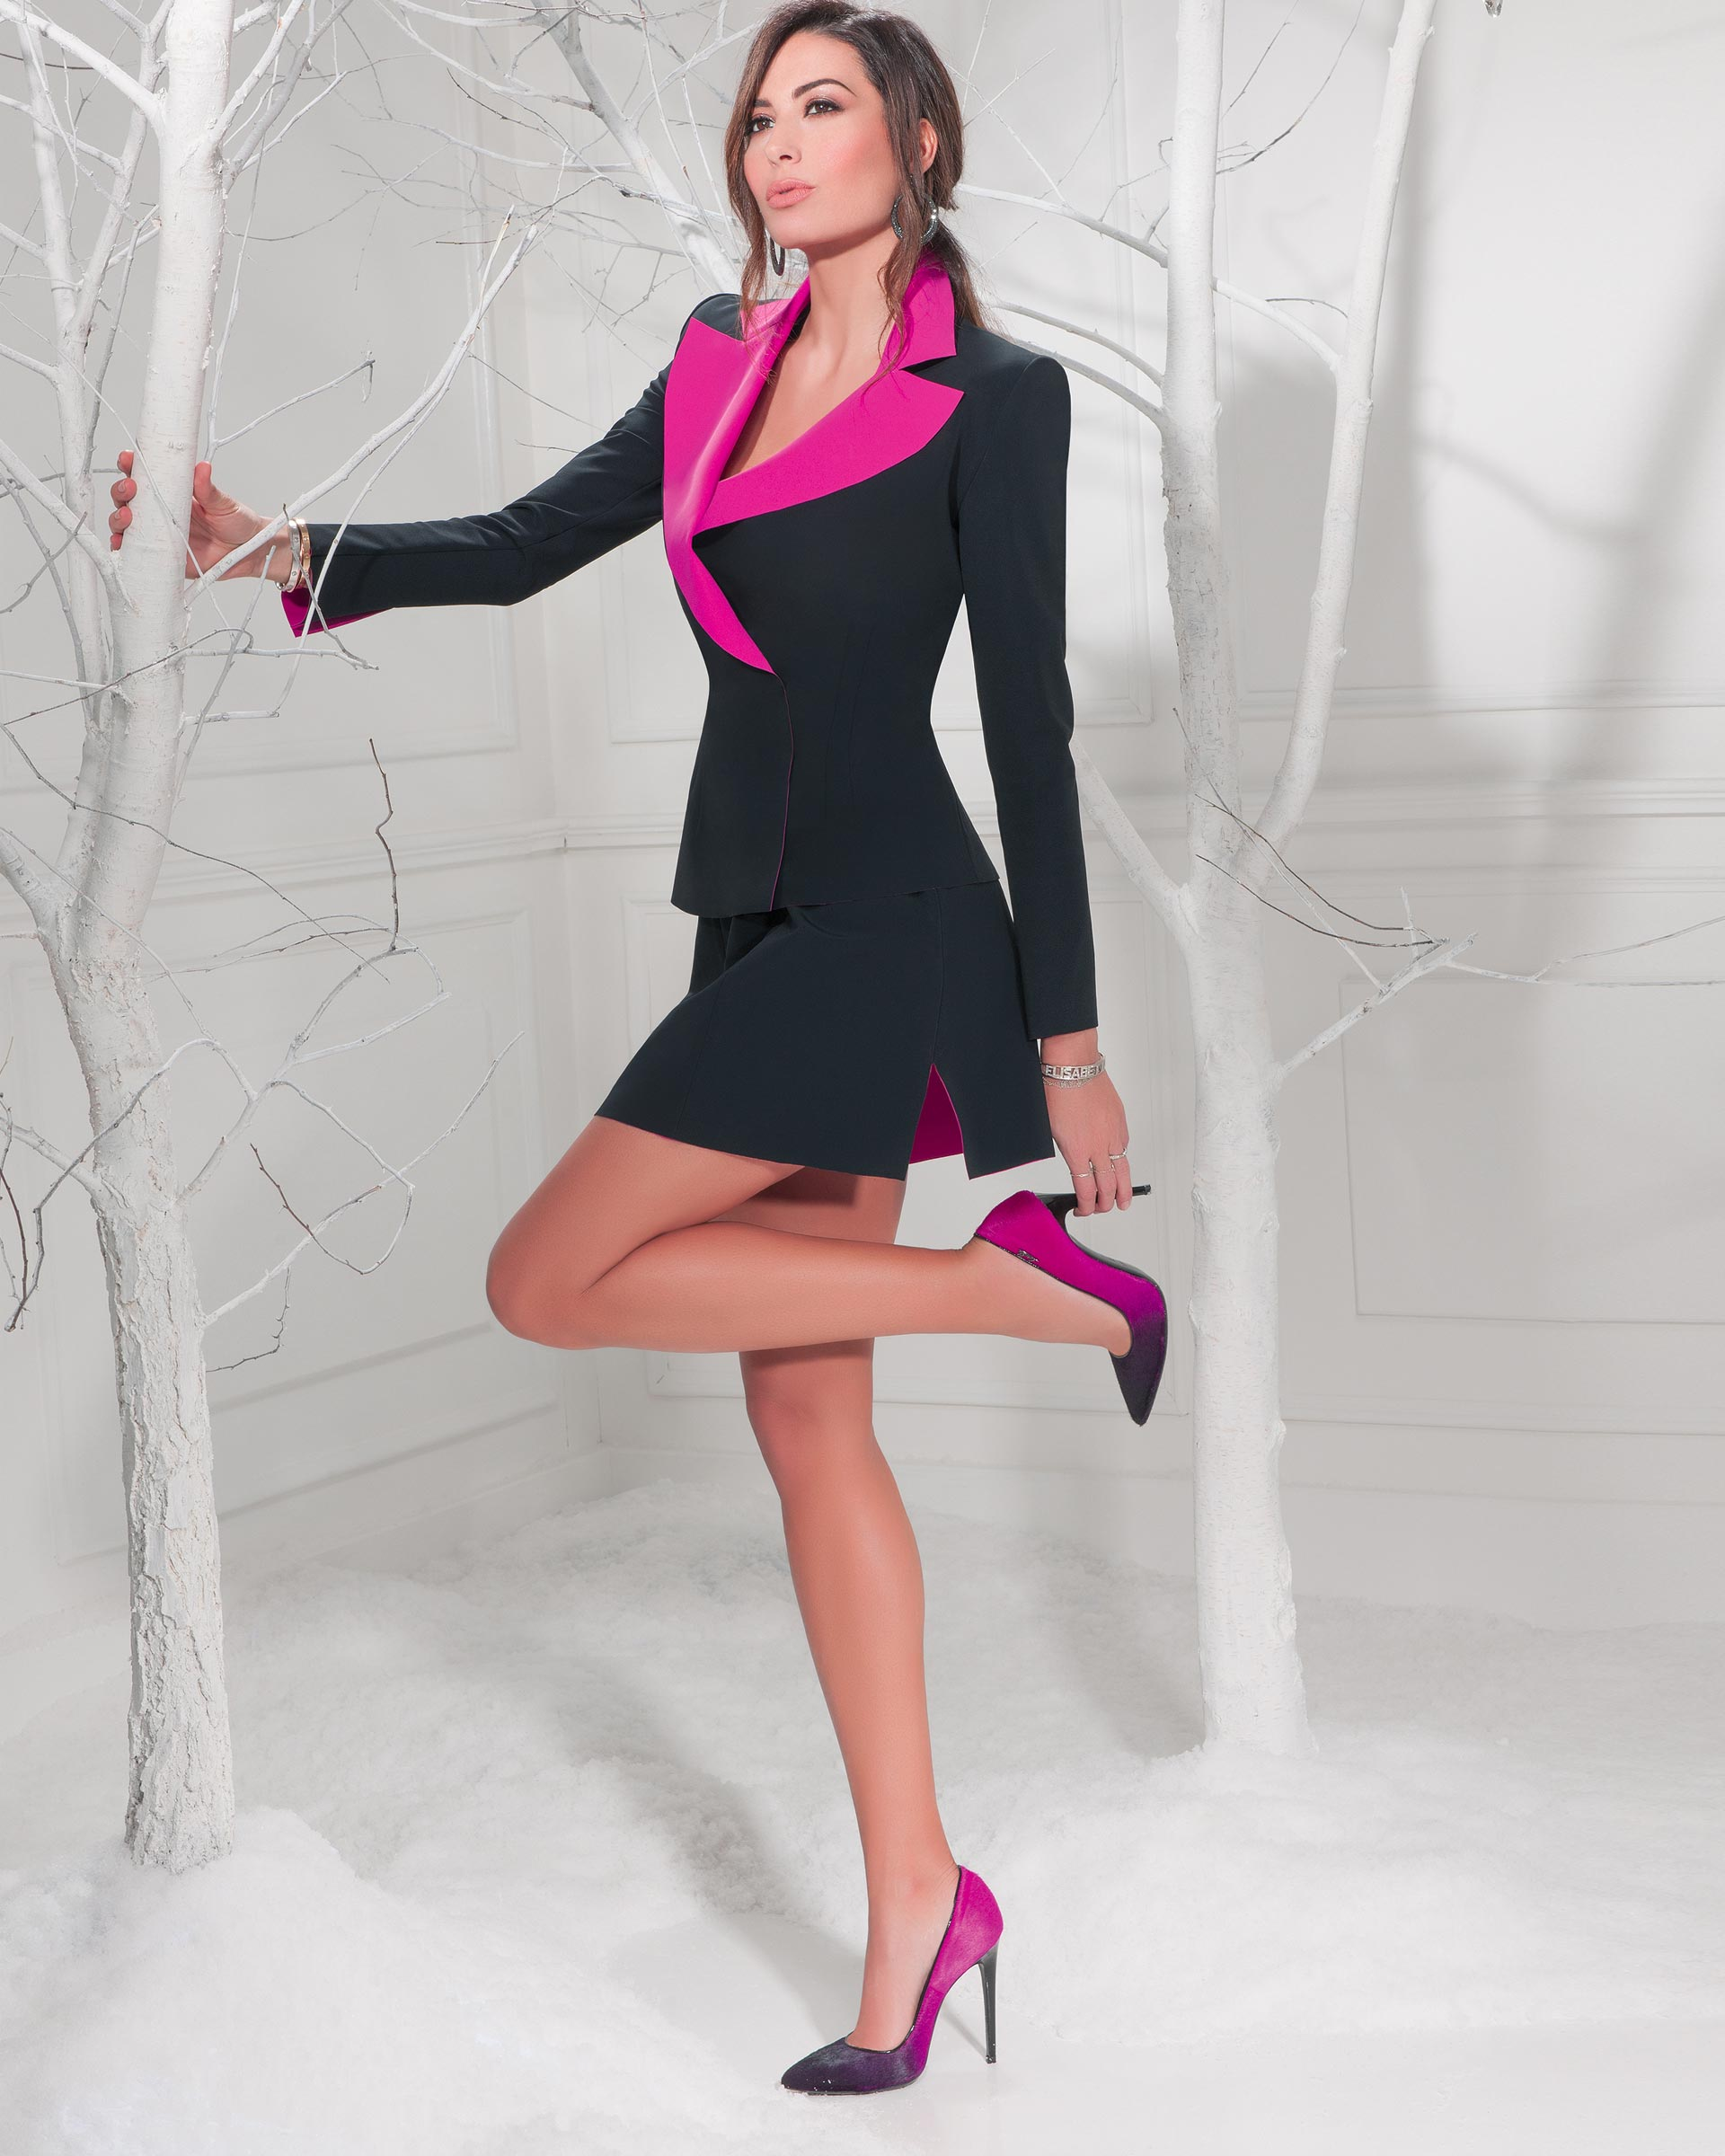 Loriblu.com | Boutique ufficiale | Vendita calzature online uomo, donna, sposa